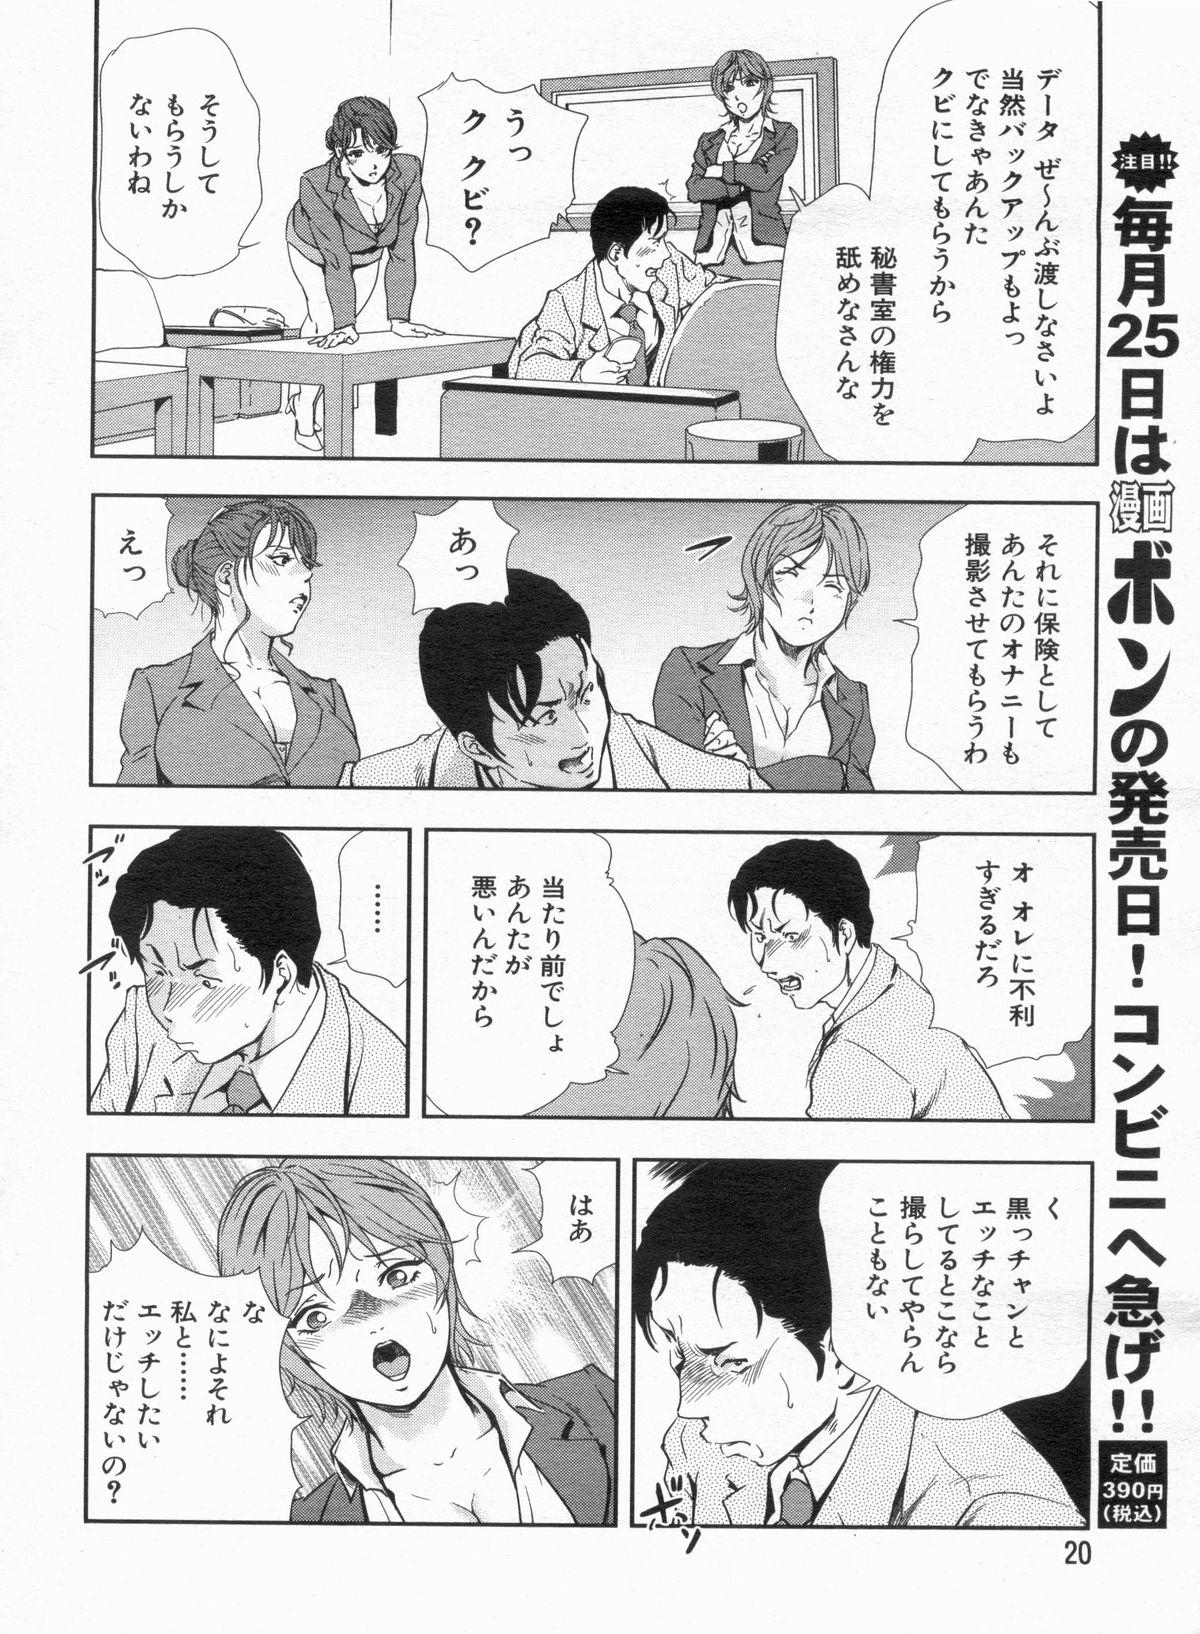 Manga Bon 2013-03 19